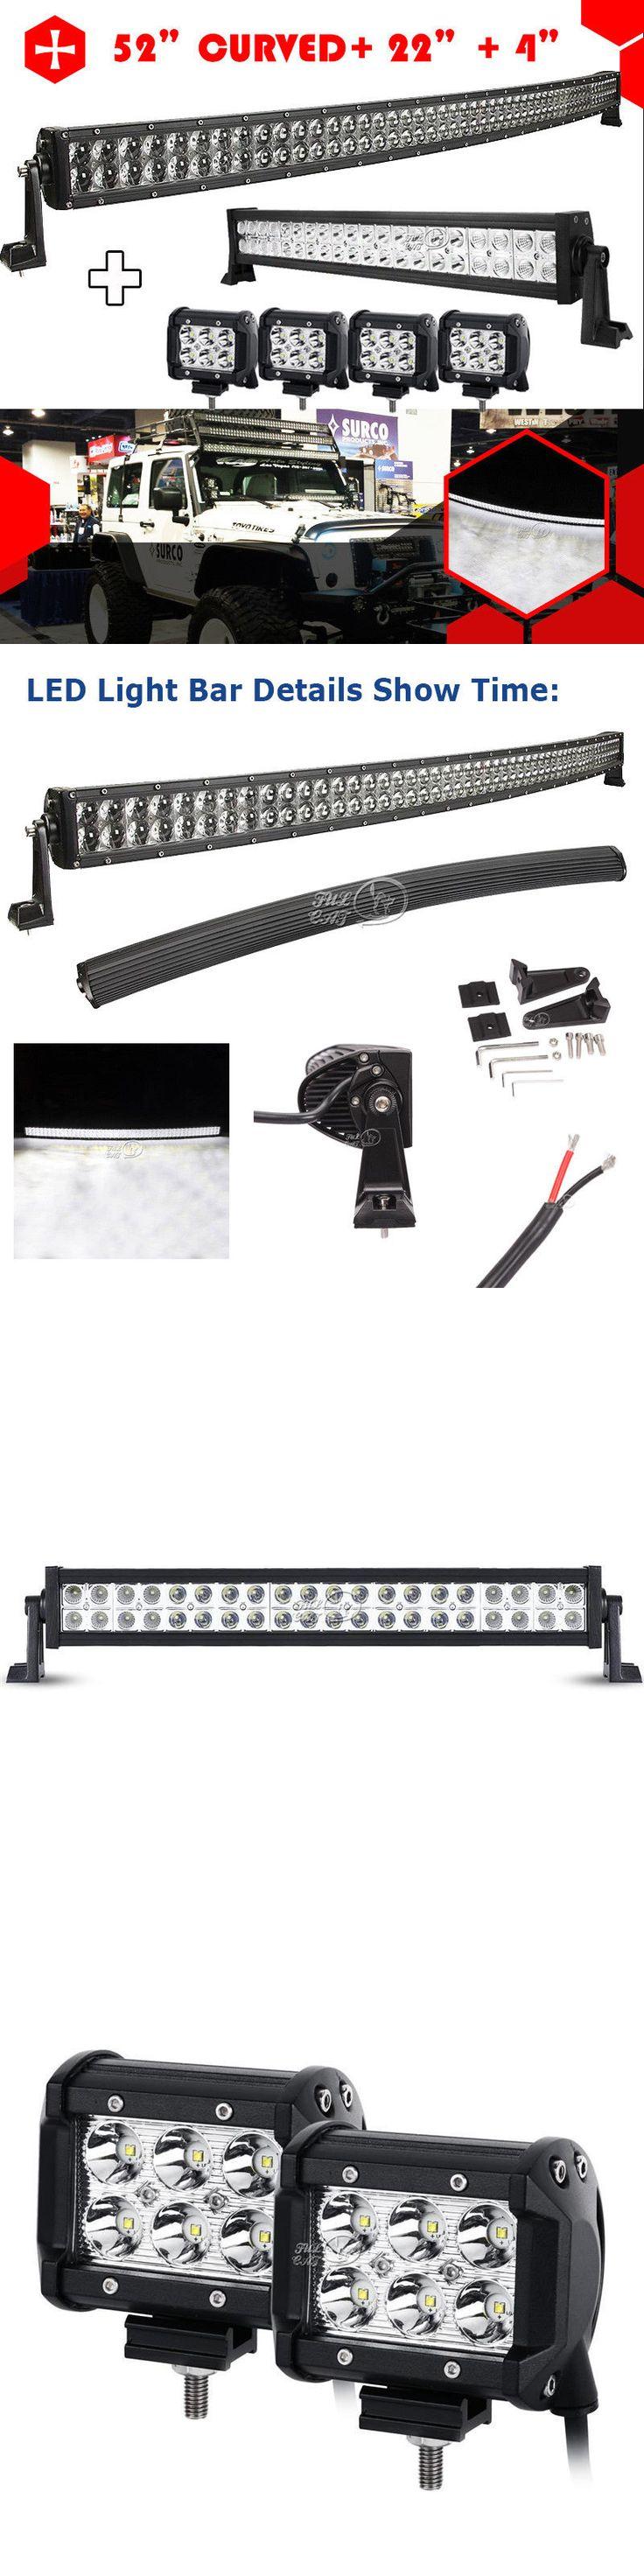 Rocker switch zombie lights led light bars amp off road lighting - Car Lighting 52inch 700w Curved Led Light Bar 22 280w 4 18w Offroad